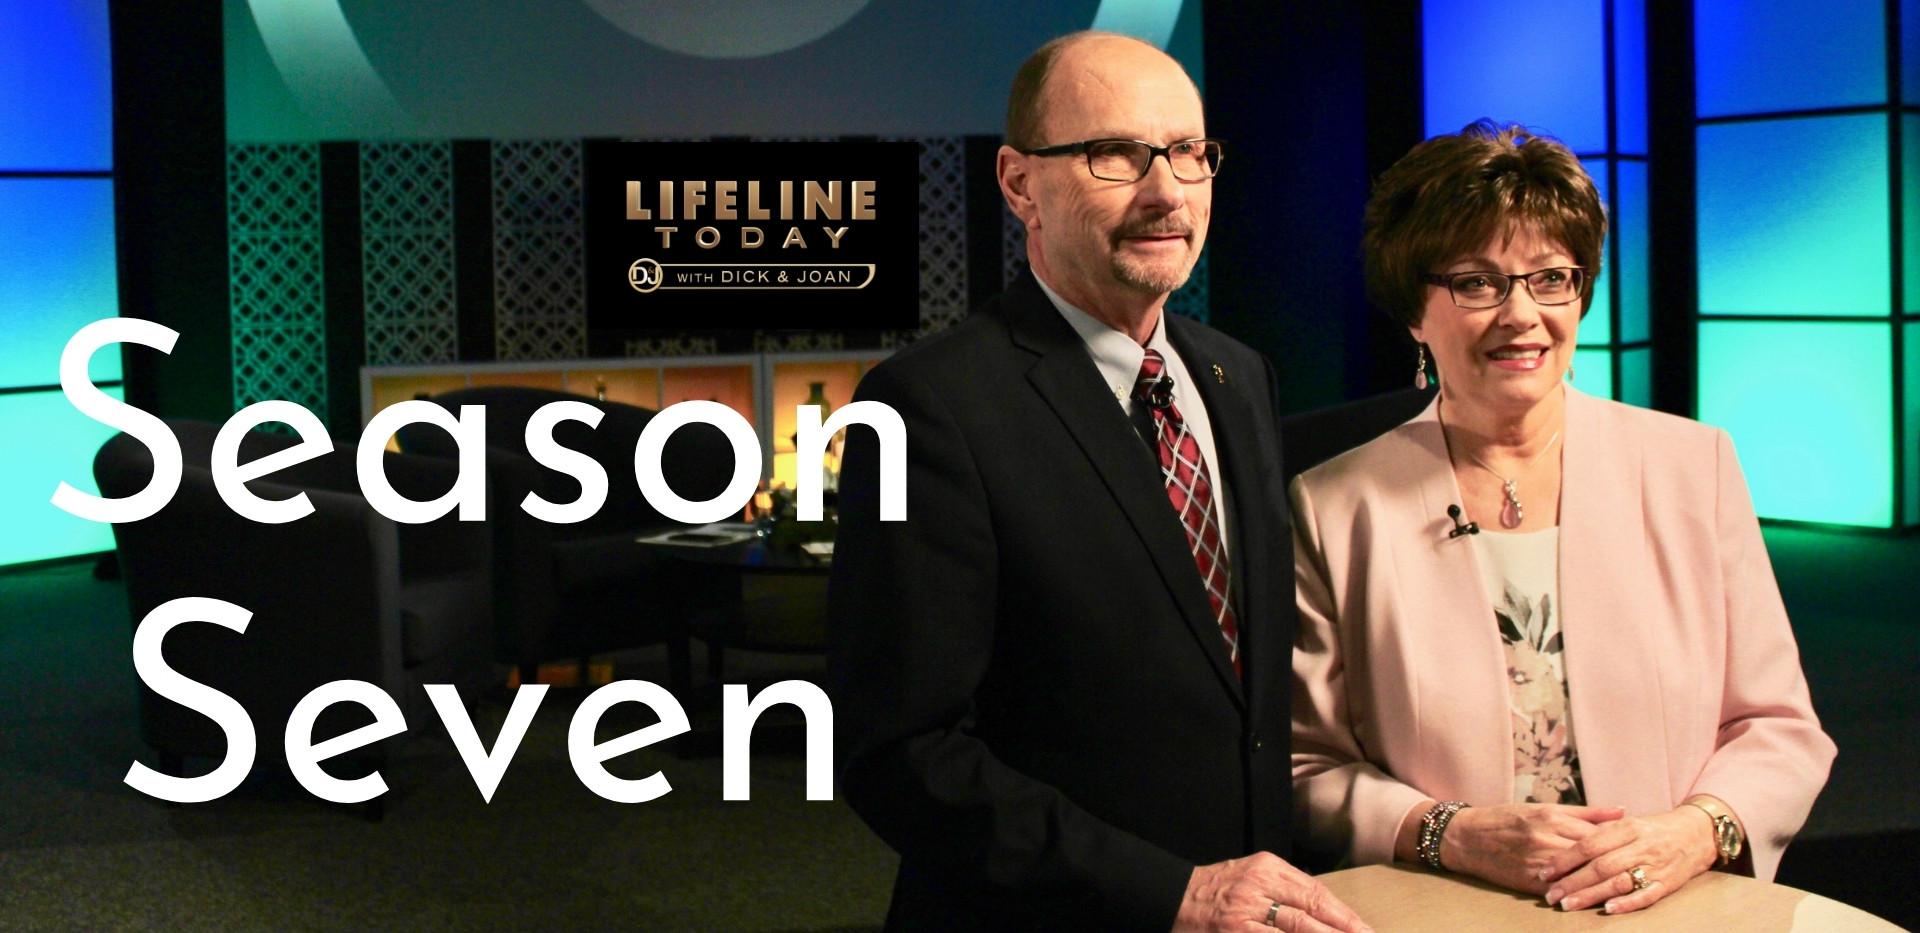 LIFELINE TODAY | Season 7, Episode 218| Rob & Fran Parker